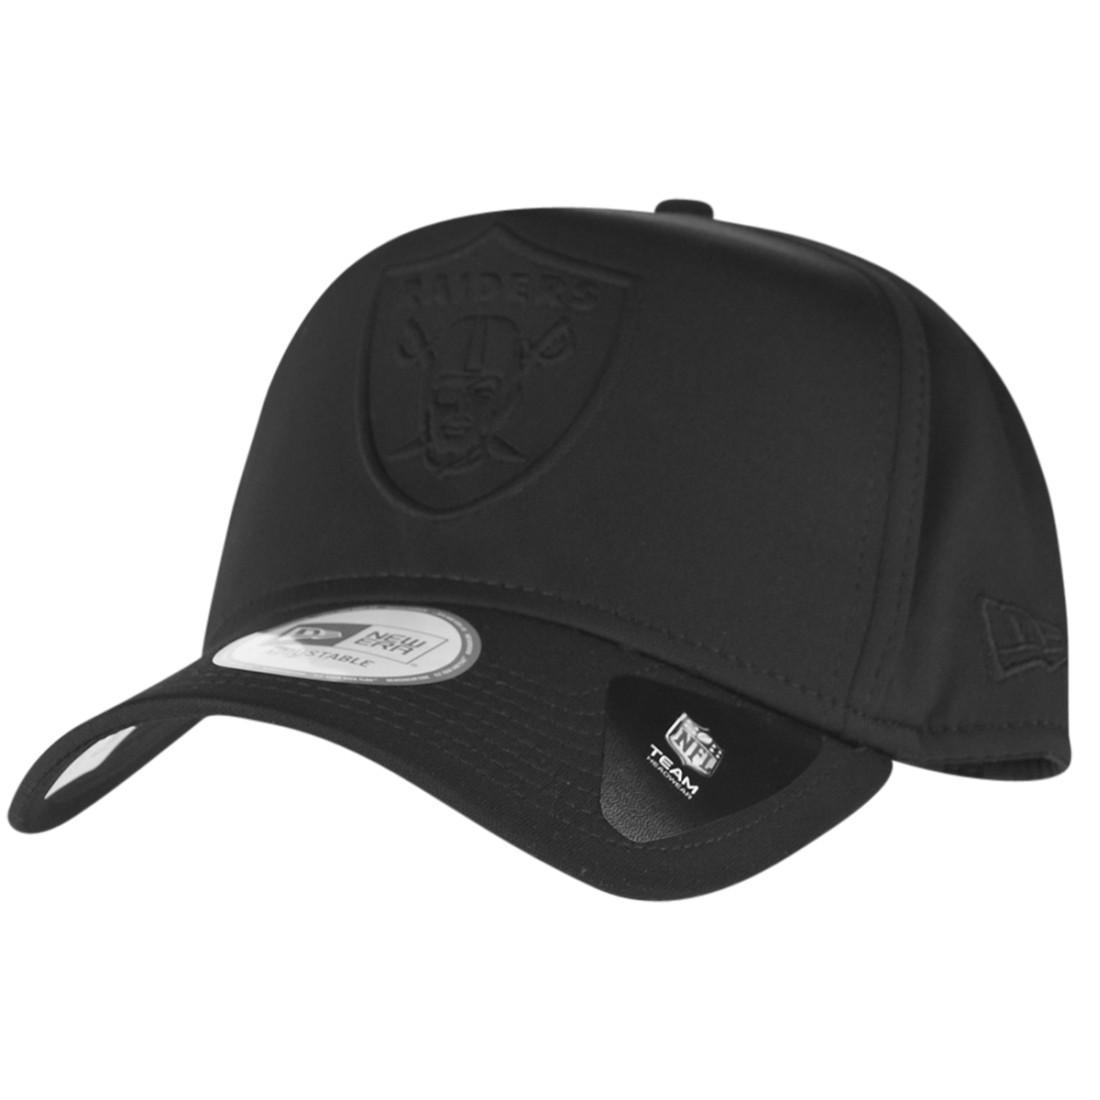 Details about New Era A-Frame Trucker Cap - NFL Oakland Raiders black 717ac45241f